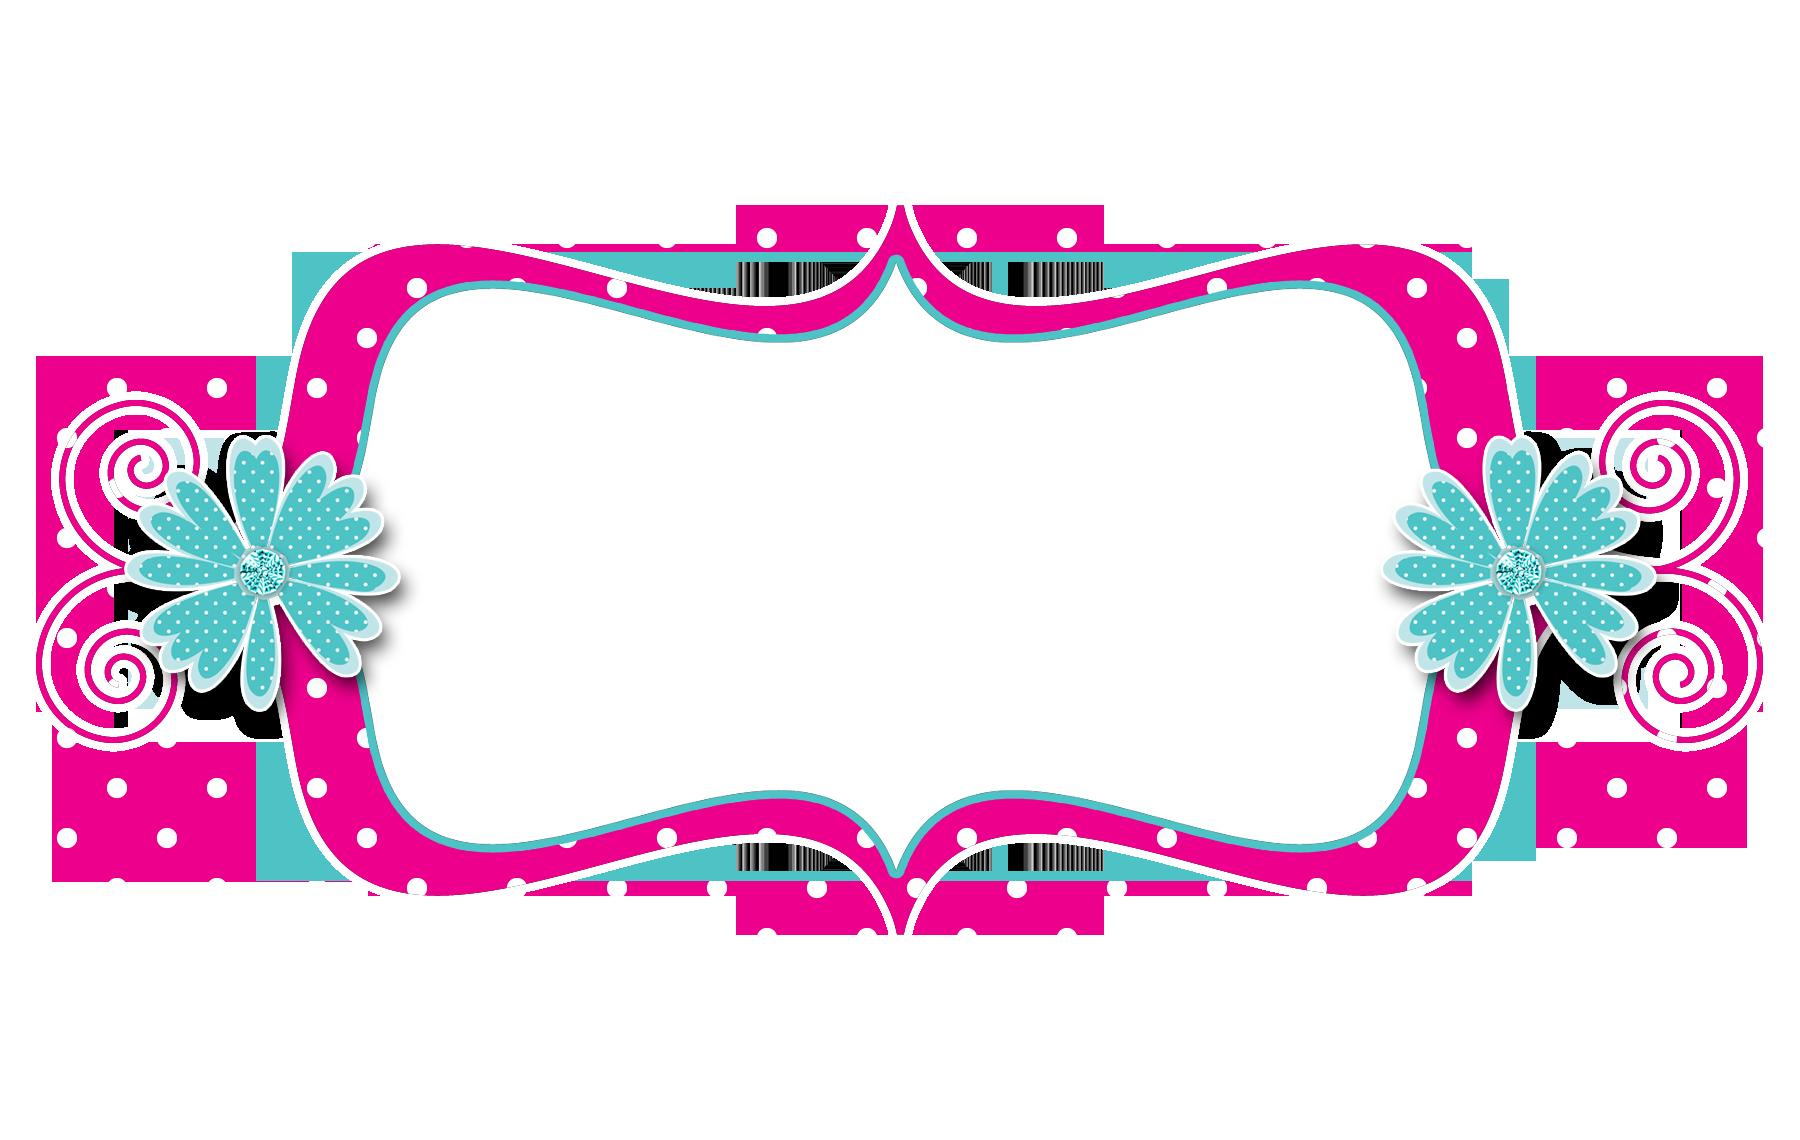 Polka Dot Border Clipart | Free download best Polka Dot Border ...